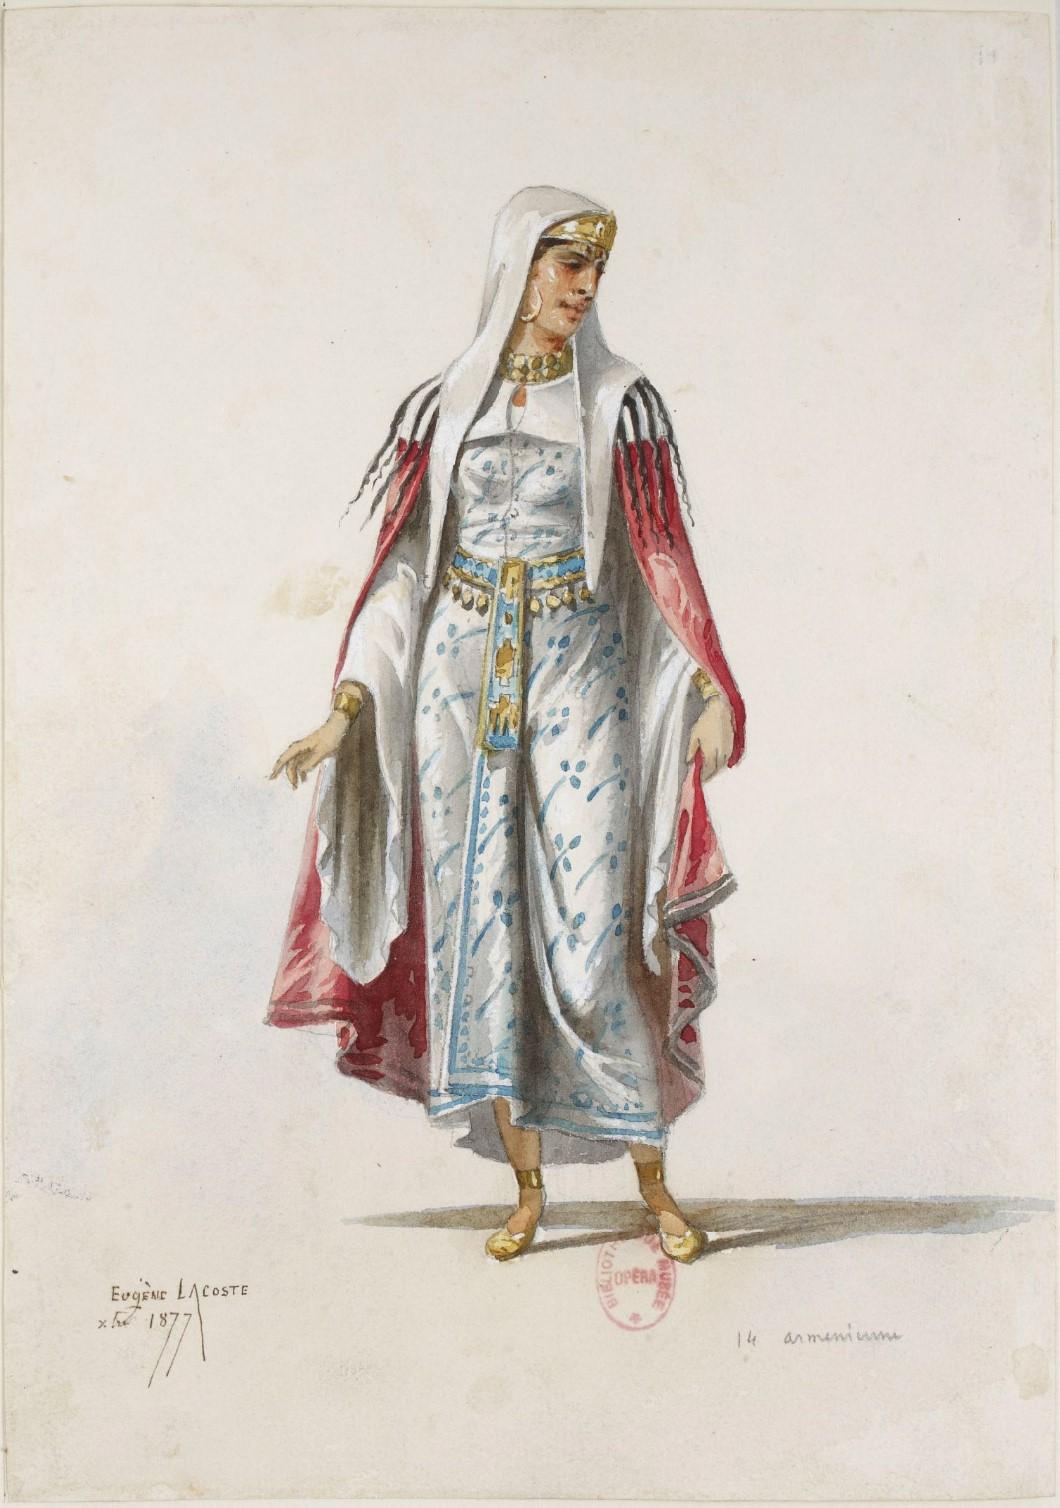 Armenian lady by Eugene Lacoste